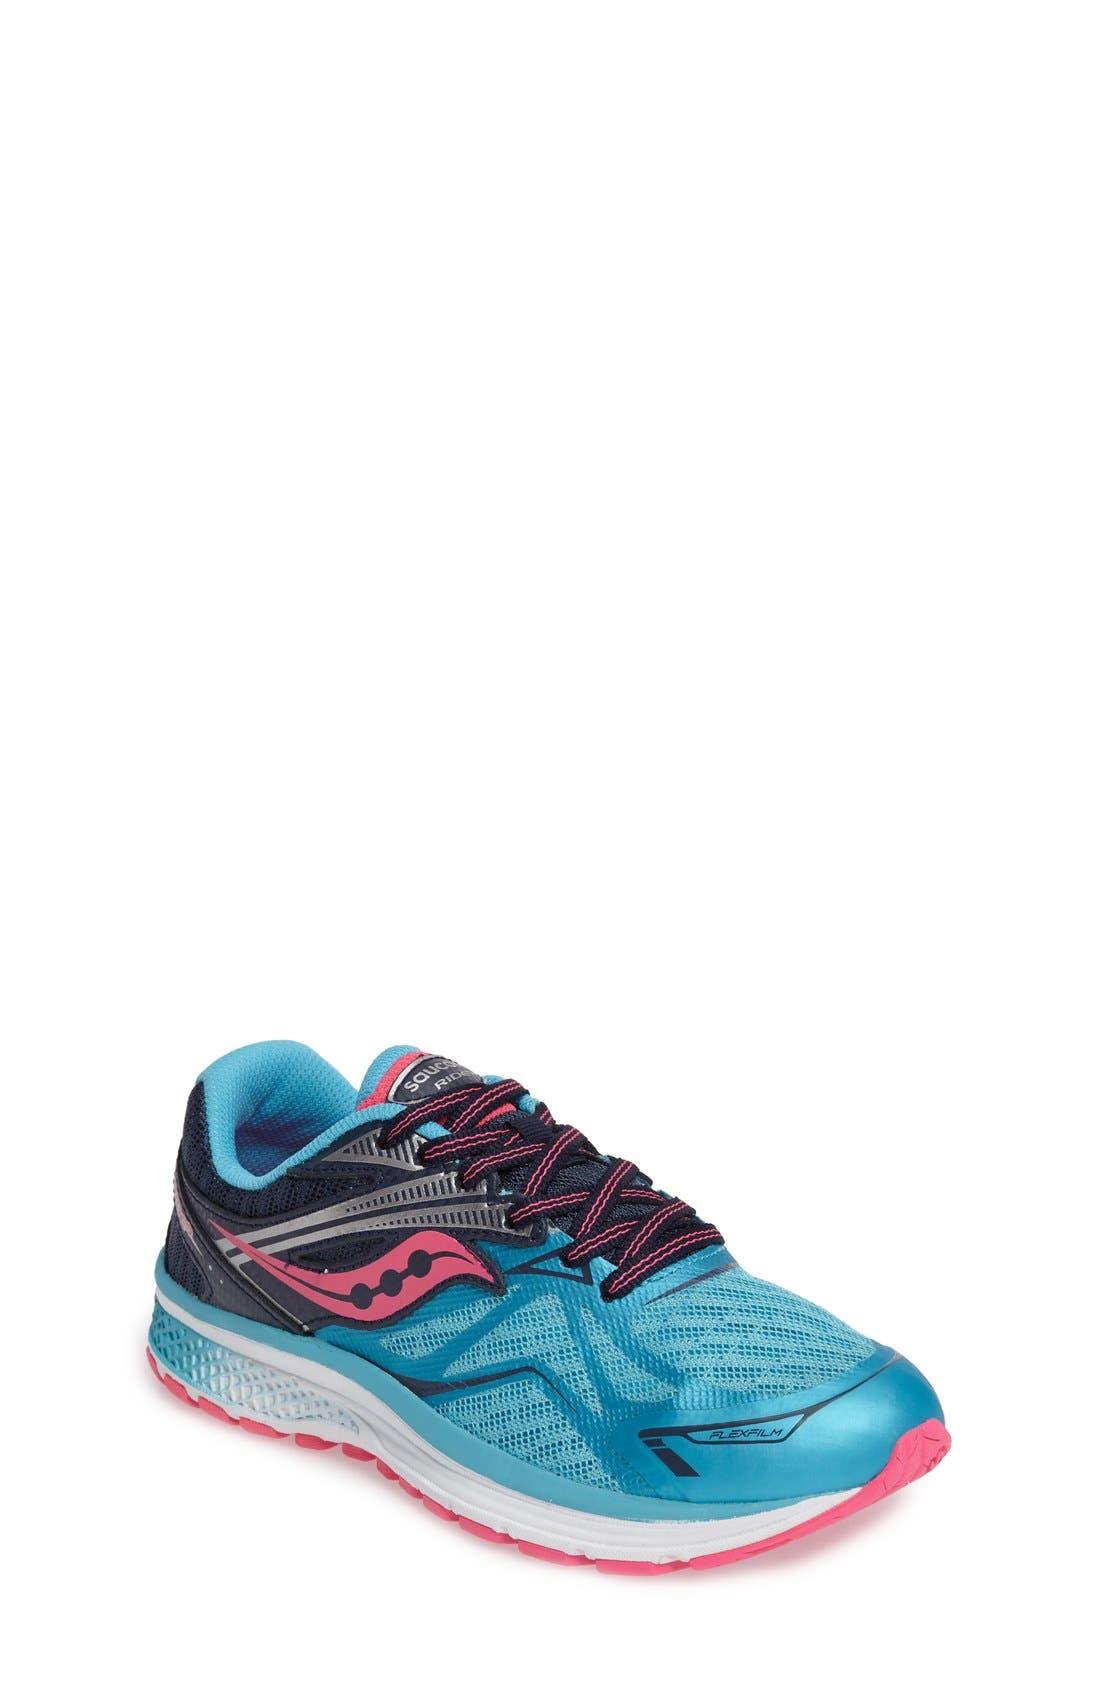 Ride 9 Sneaker,                         Main,                         color, 400